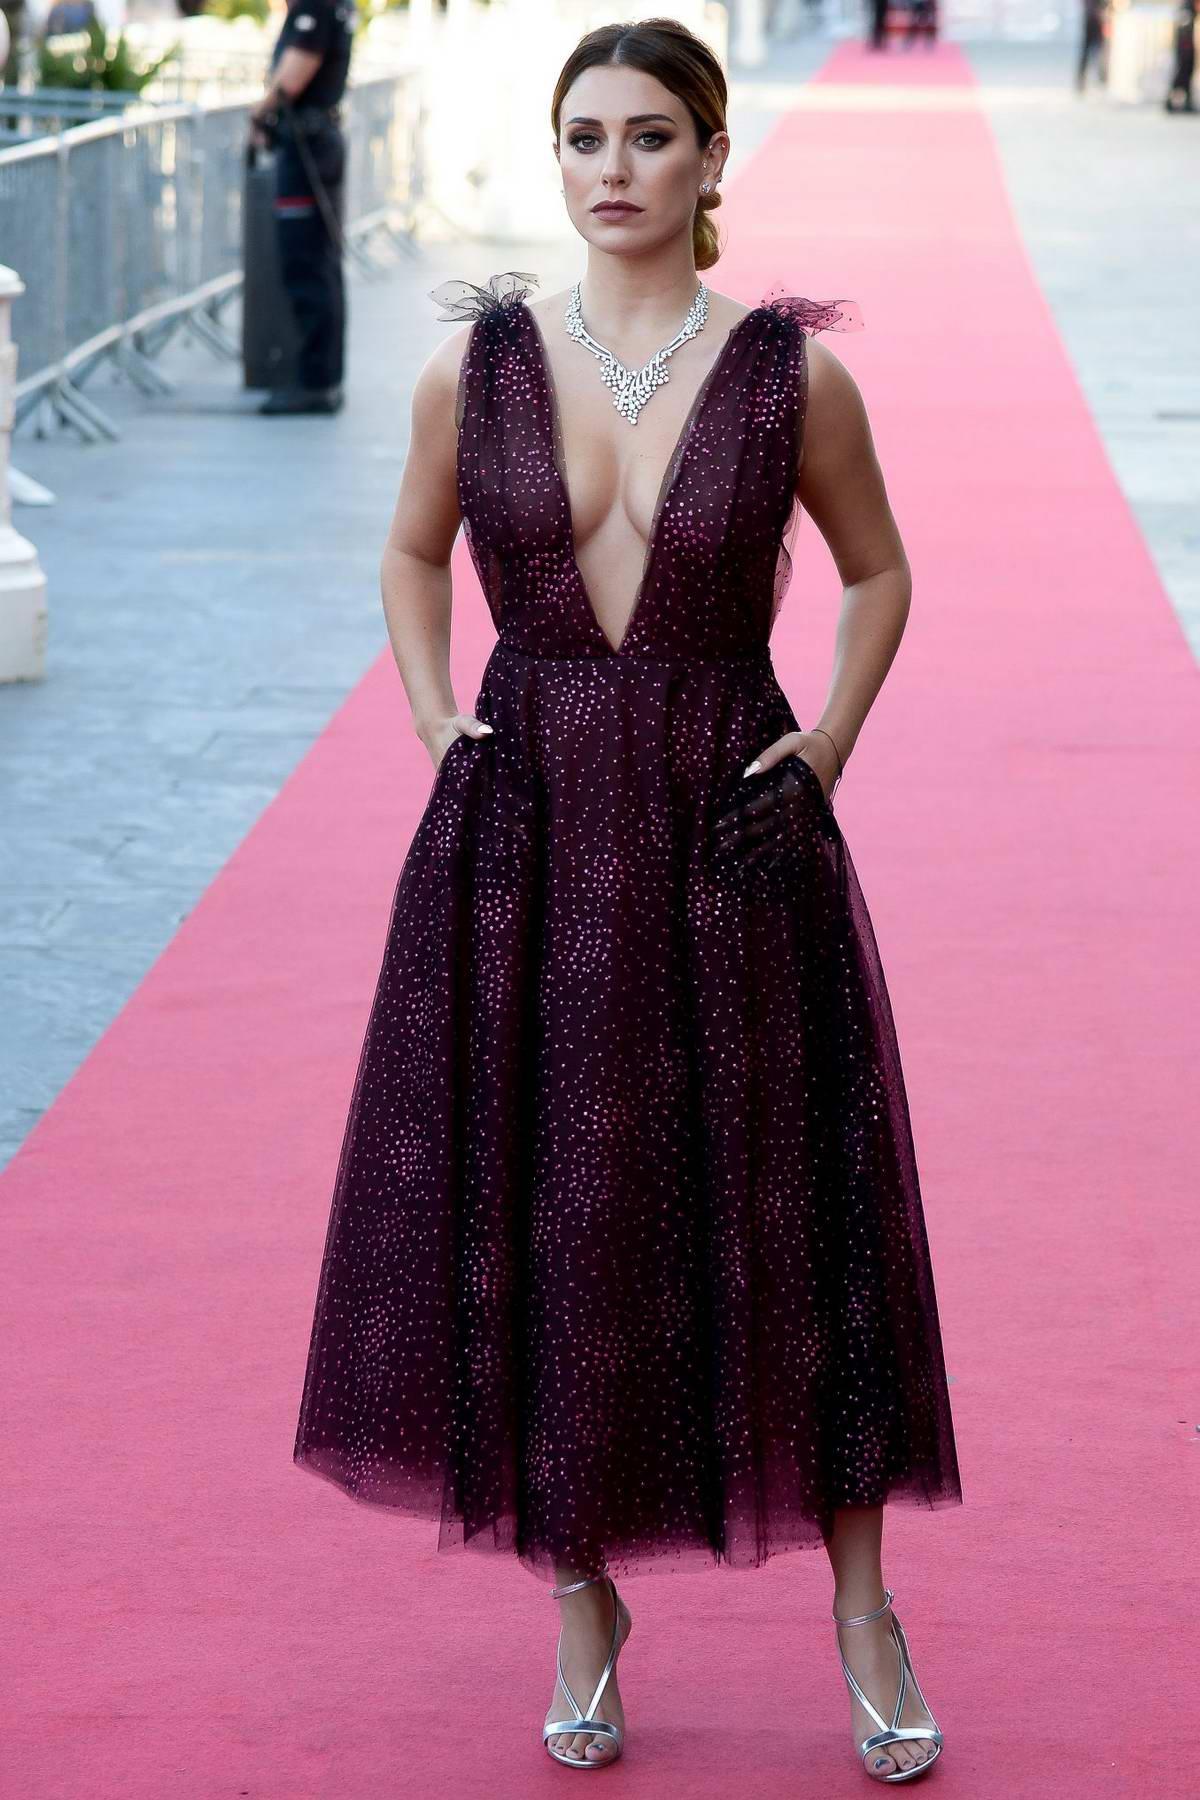 Blanca Suarez attends 'Tiempo Despues' premiere during the 66th San Sebastian International Film Festival in San Sebastian, Spain